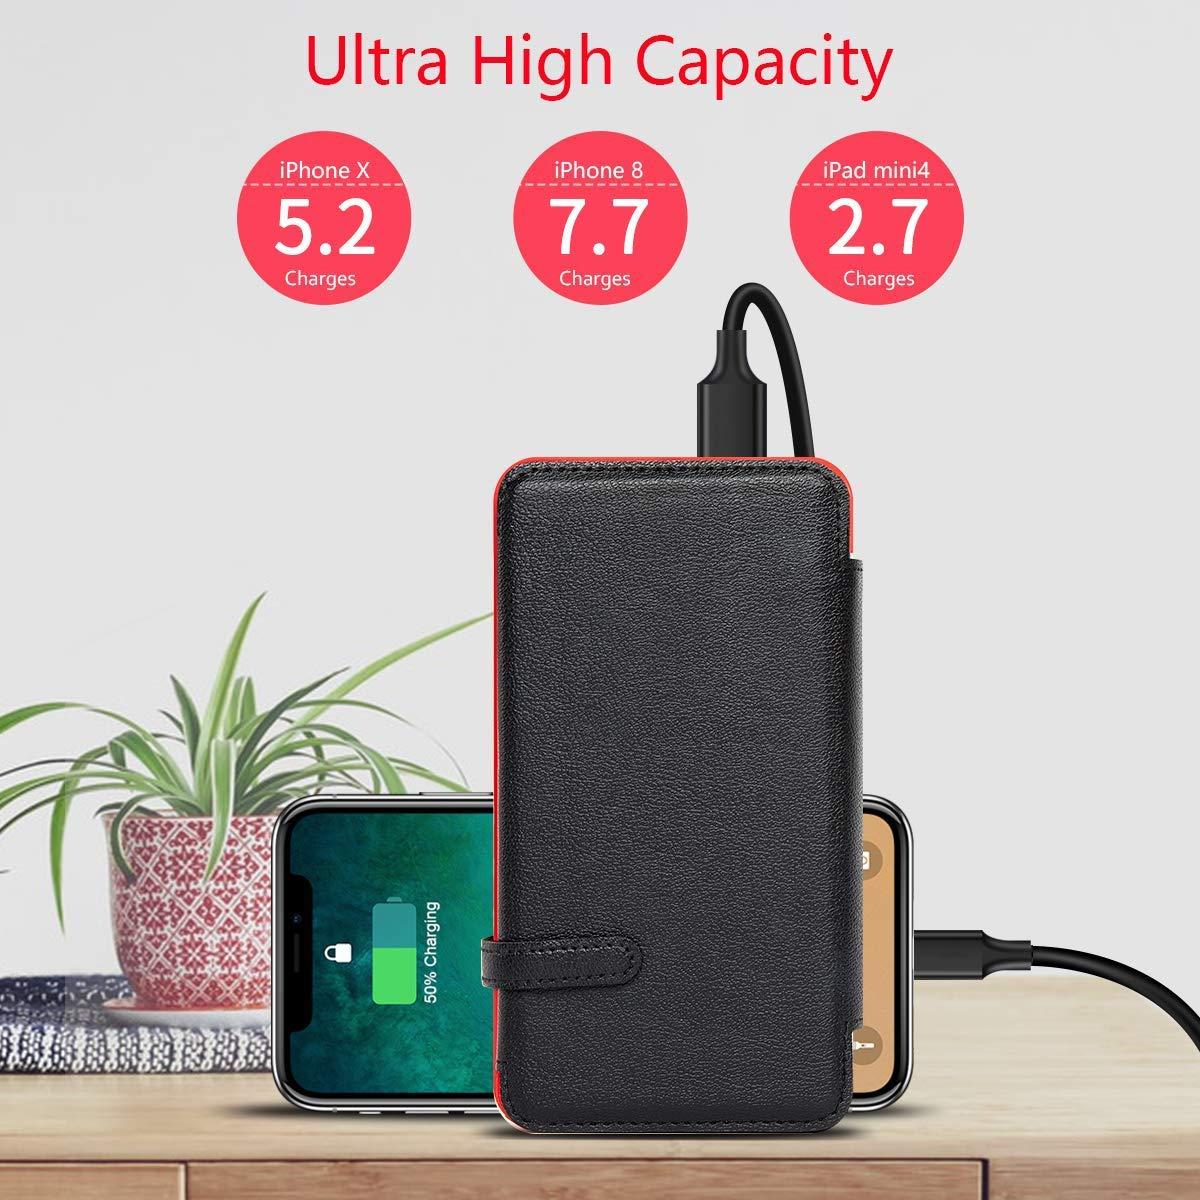 Soluser Bater/ía Externa Solar 20000mAh Solar Power Bank 2 Salidas USB Cargador Inal/ámbrico Port/átil con indicador de Estado LED y Linterna SOS para iPhone iPad Dispositivos Android